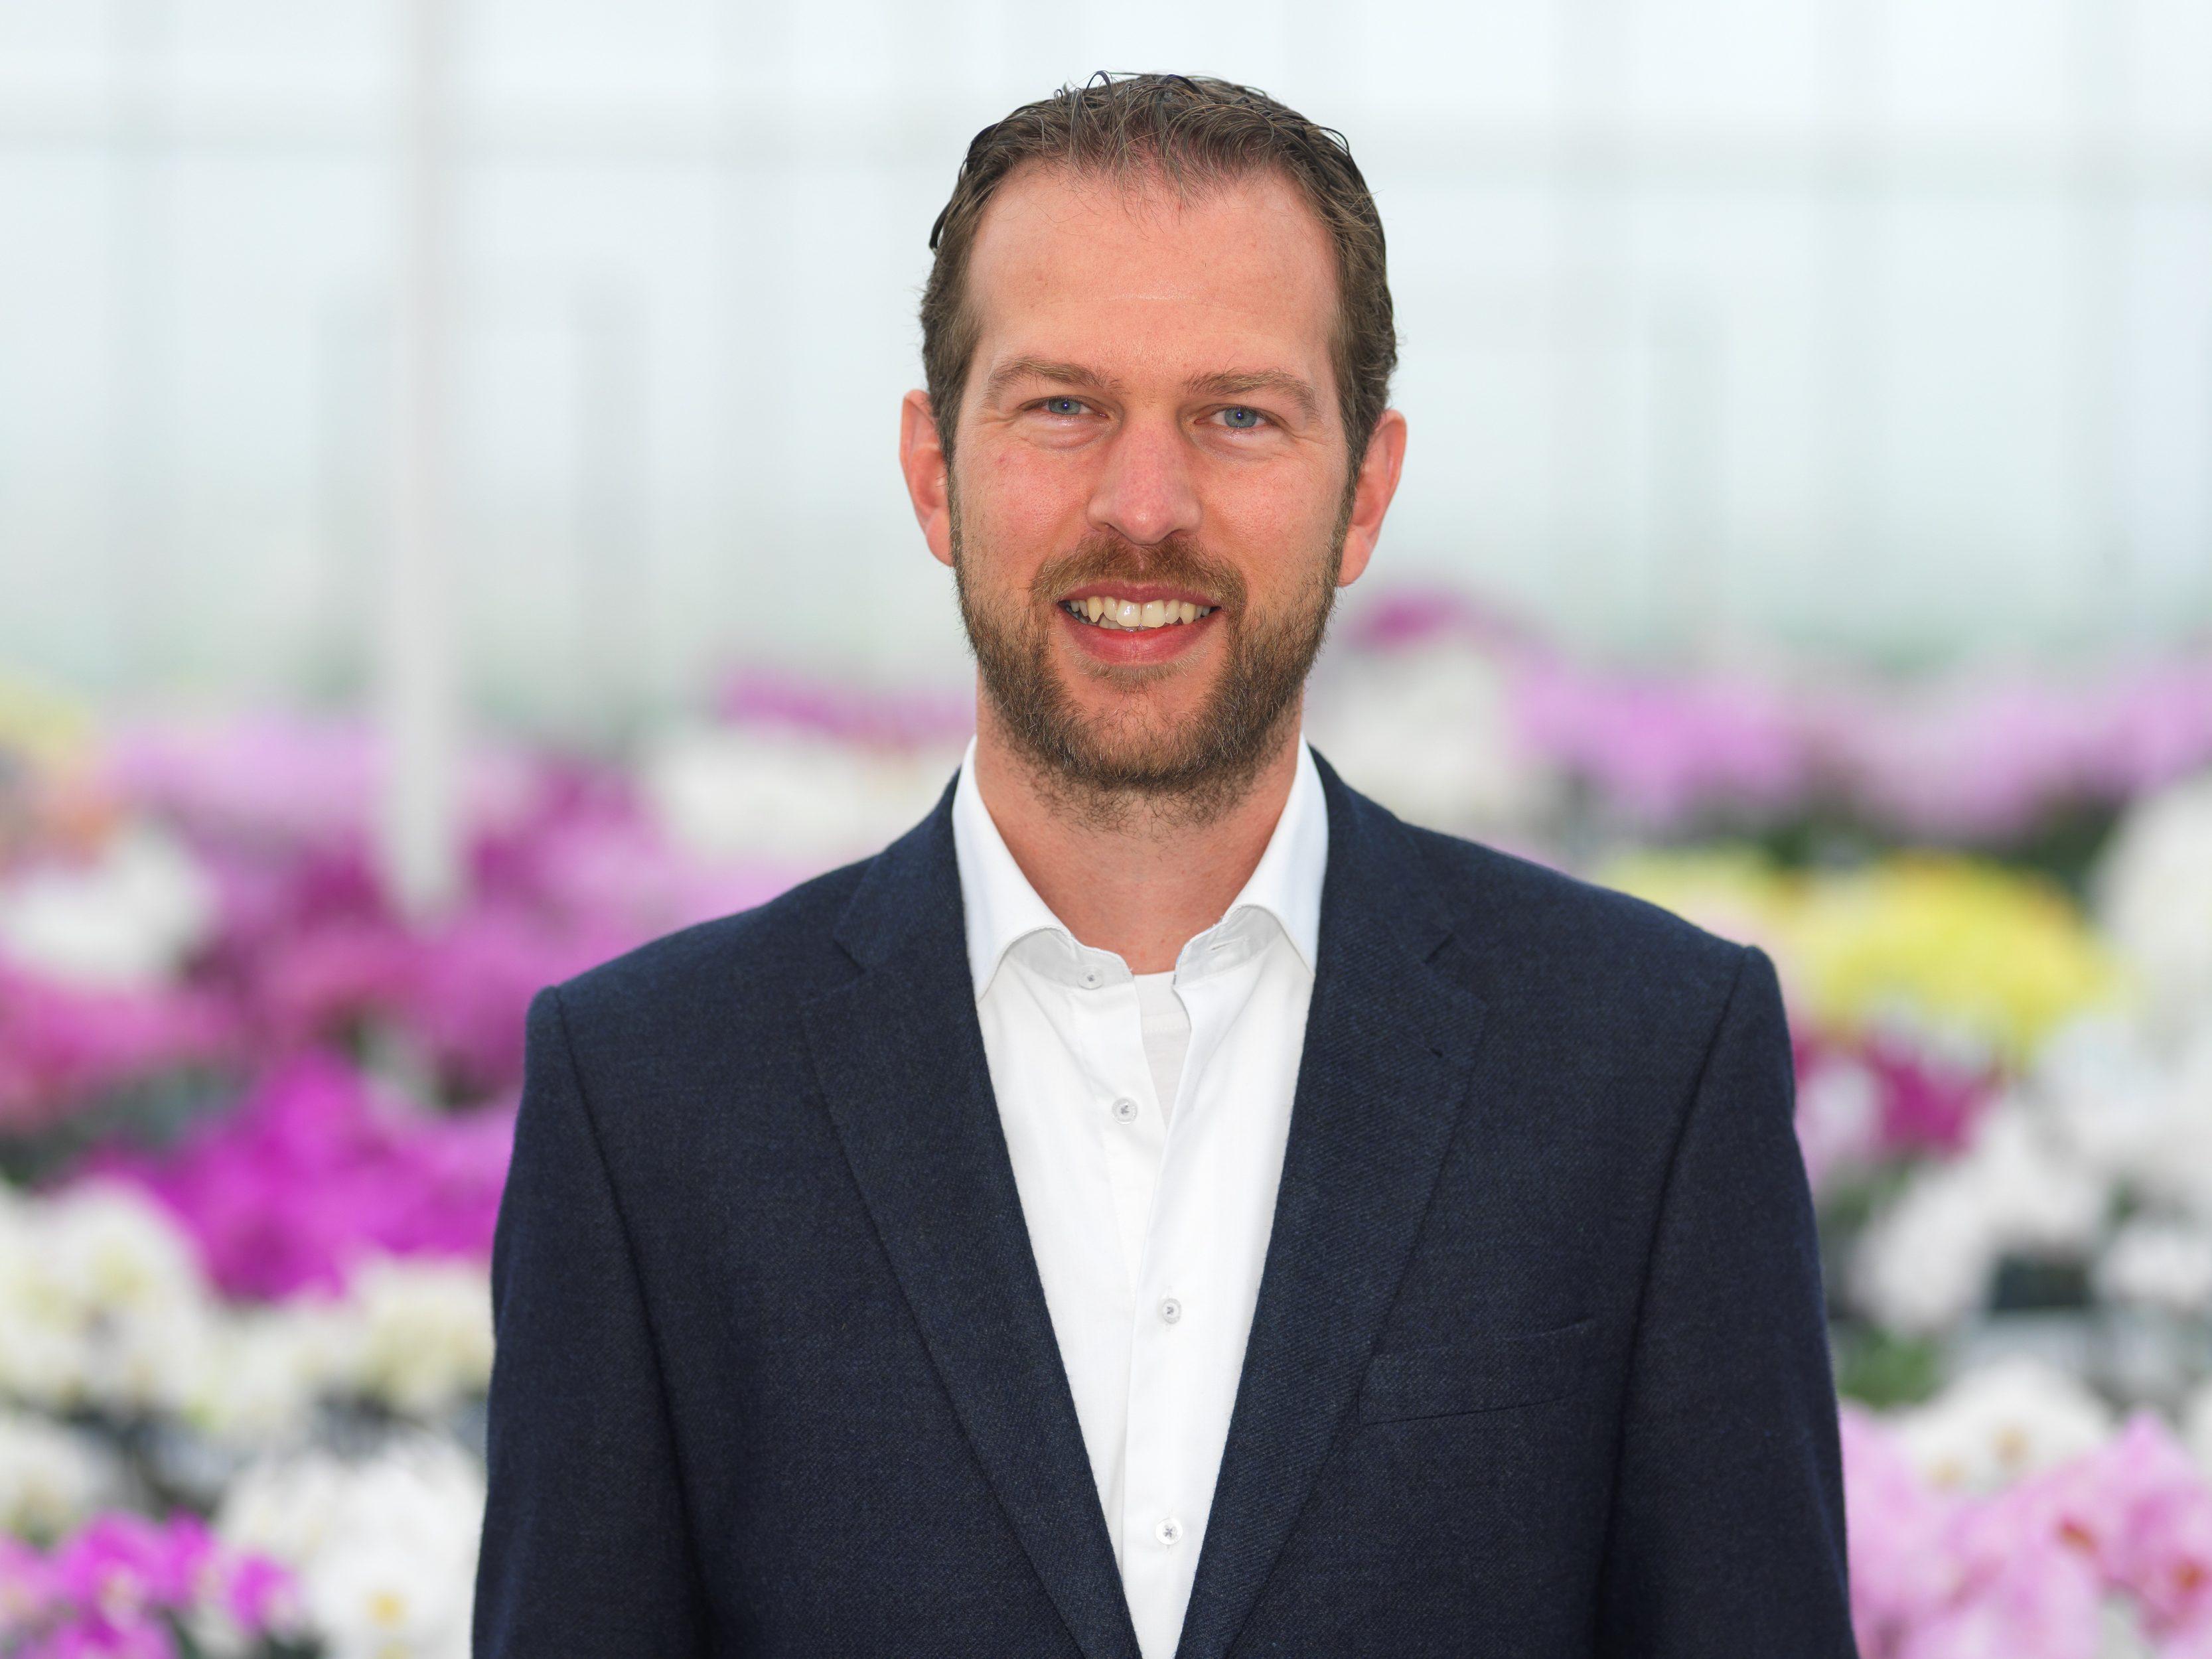 Marco Knijnenburg, Area Manager